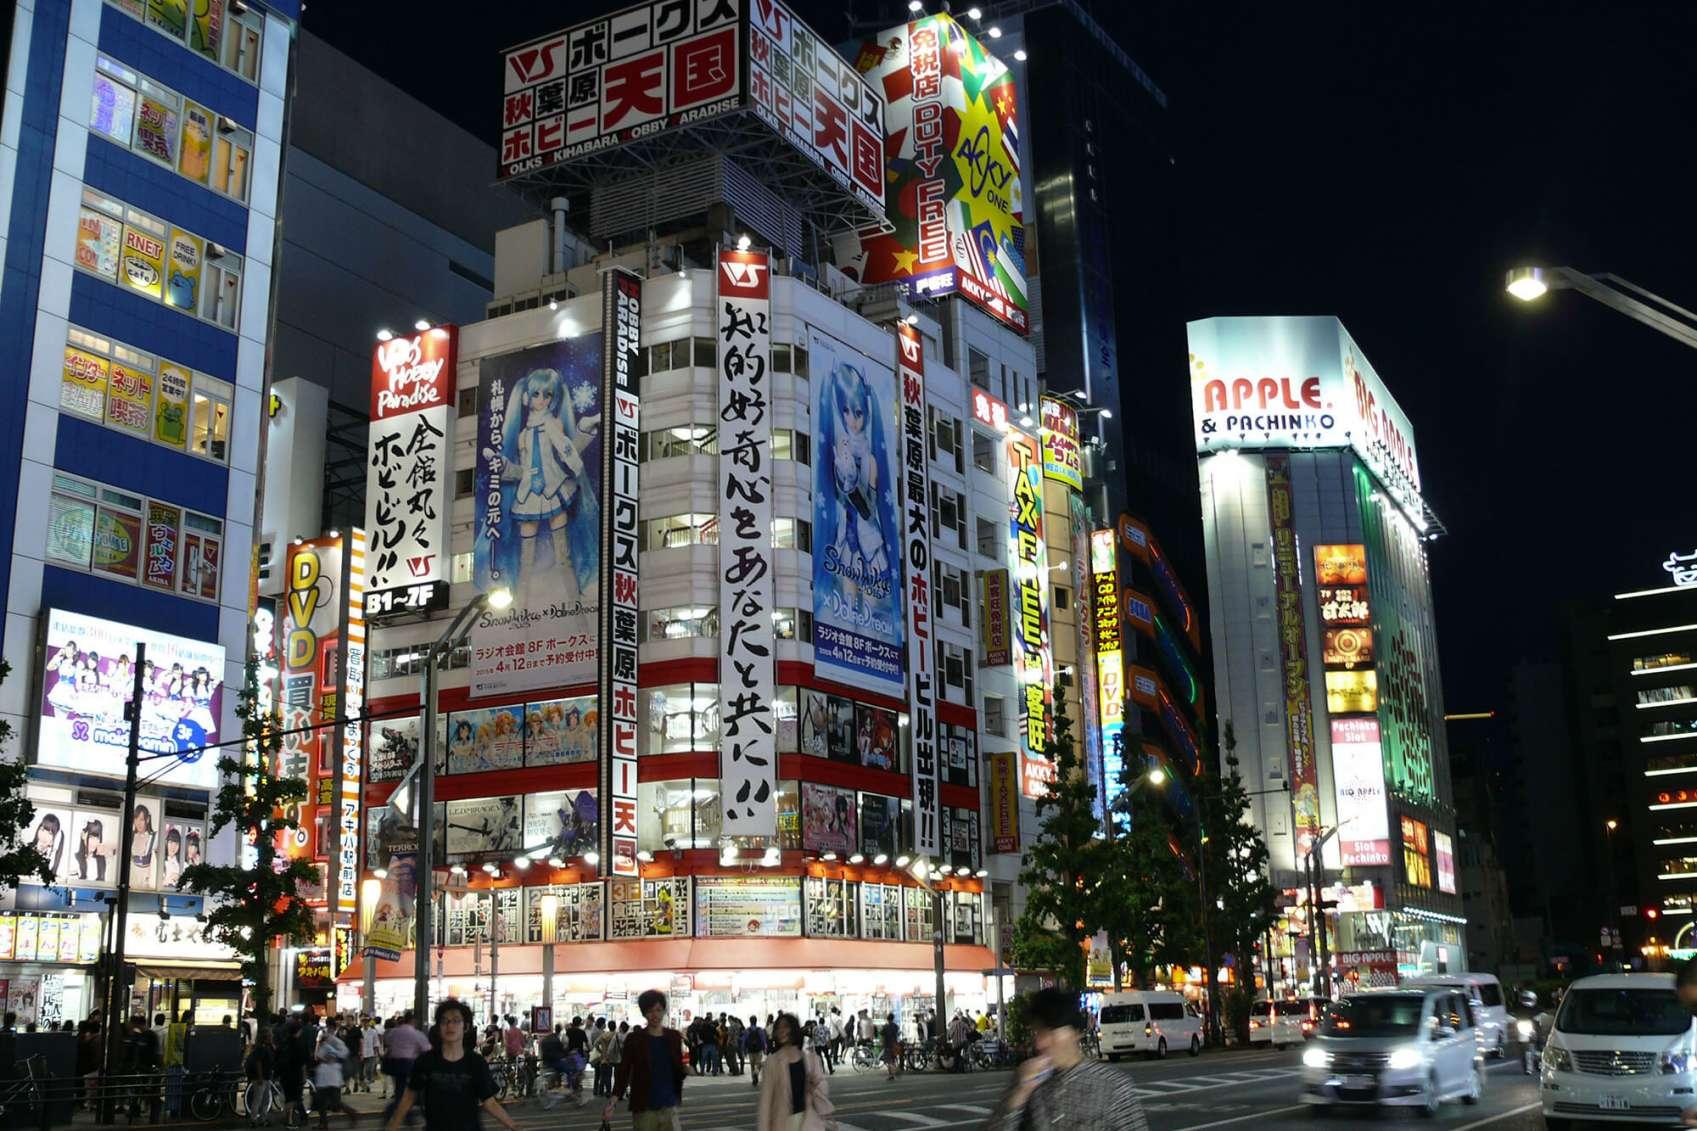 http://pururin.eu/home/m1/japonNews/1/L1130386.jpg